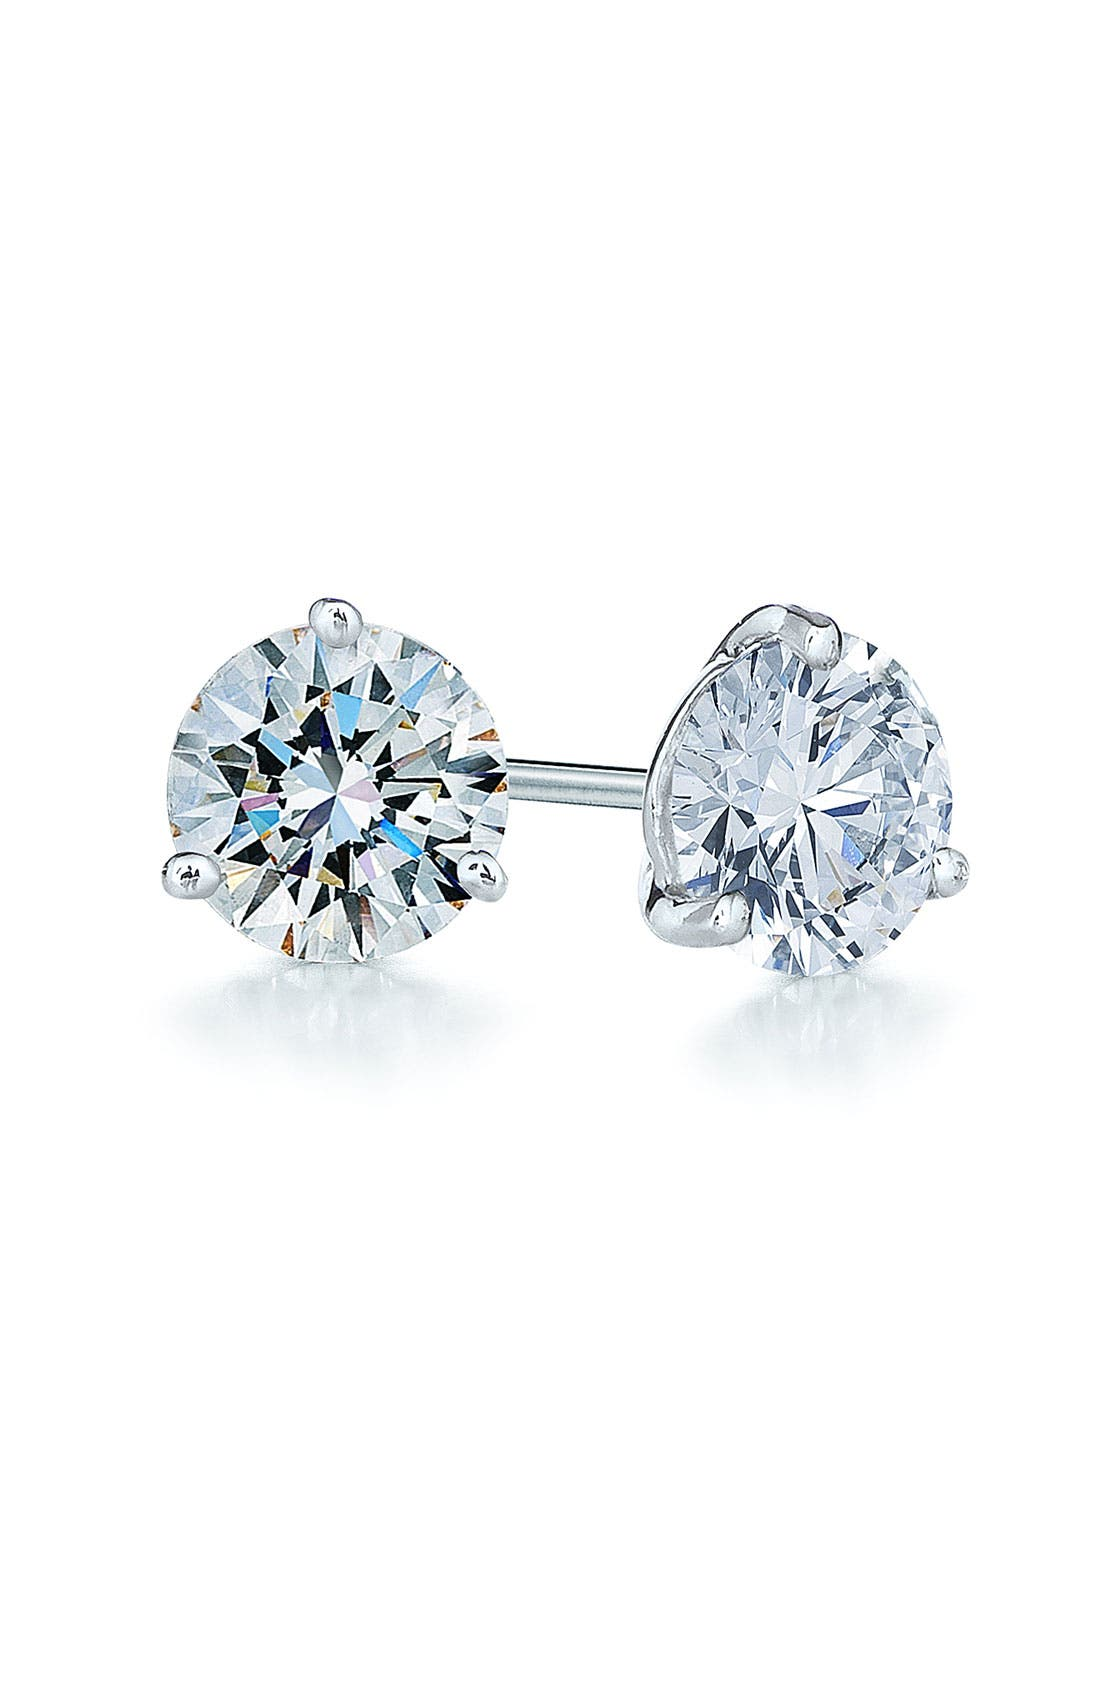 1.25ct tw Diamond & Platinum Stud Earrings,                         Main,                         color, PLATINUM